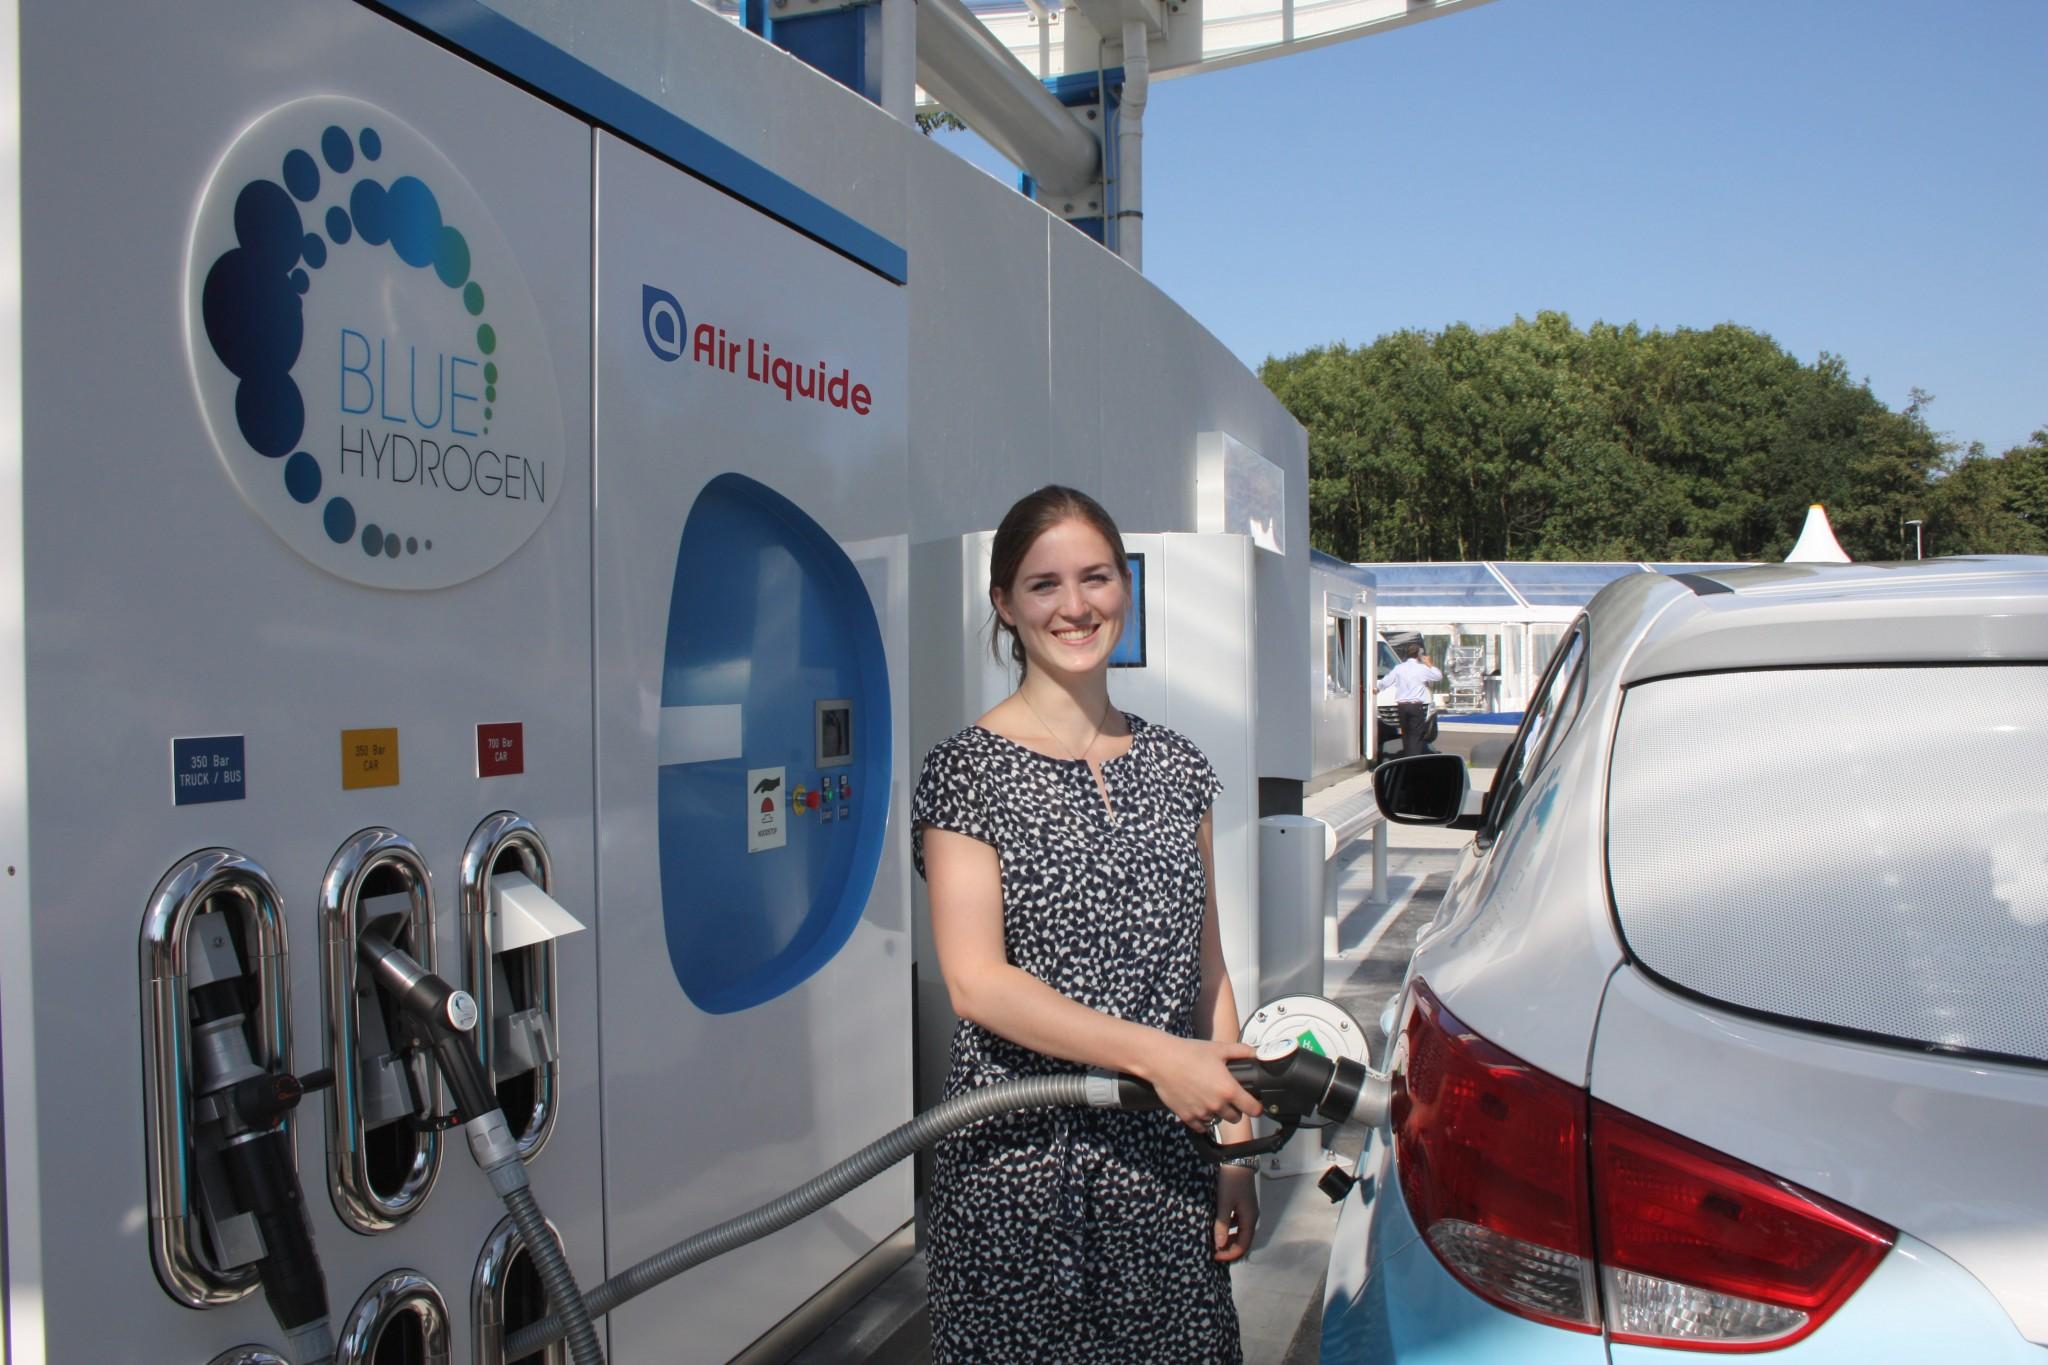 Hydrogène, Air Liquide